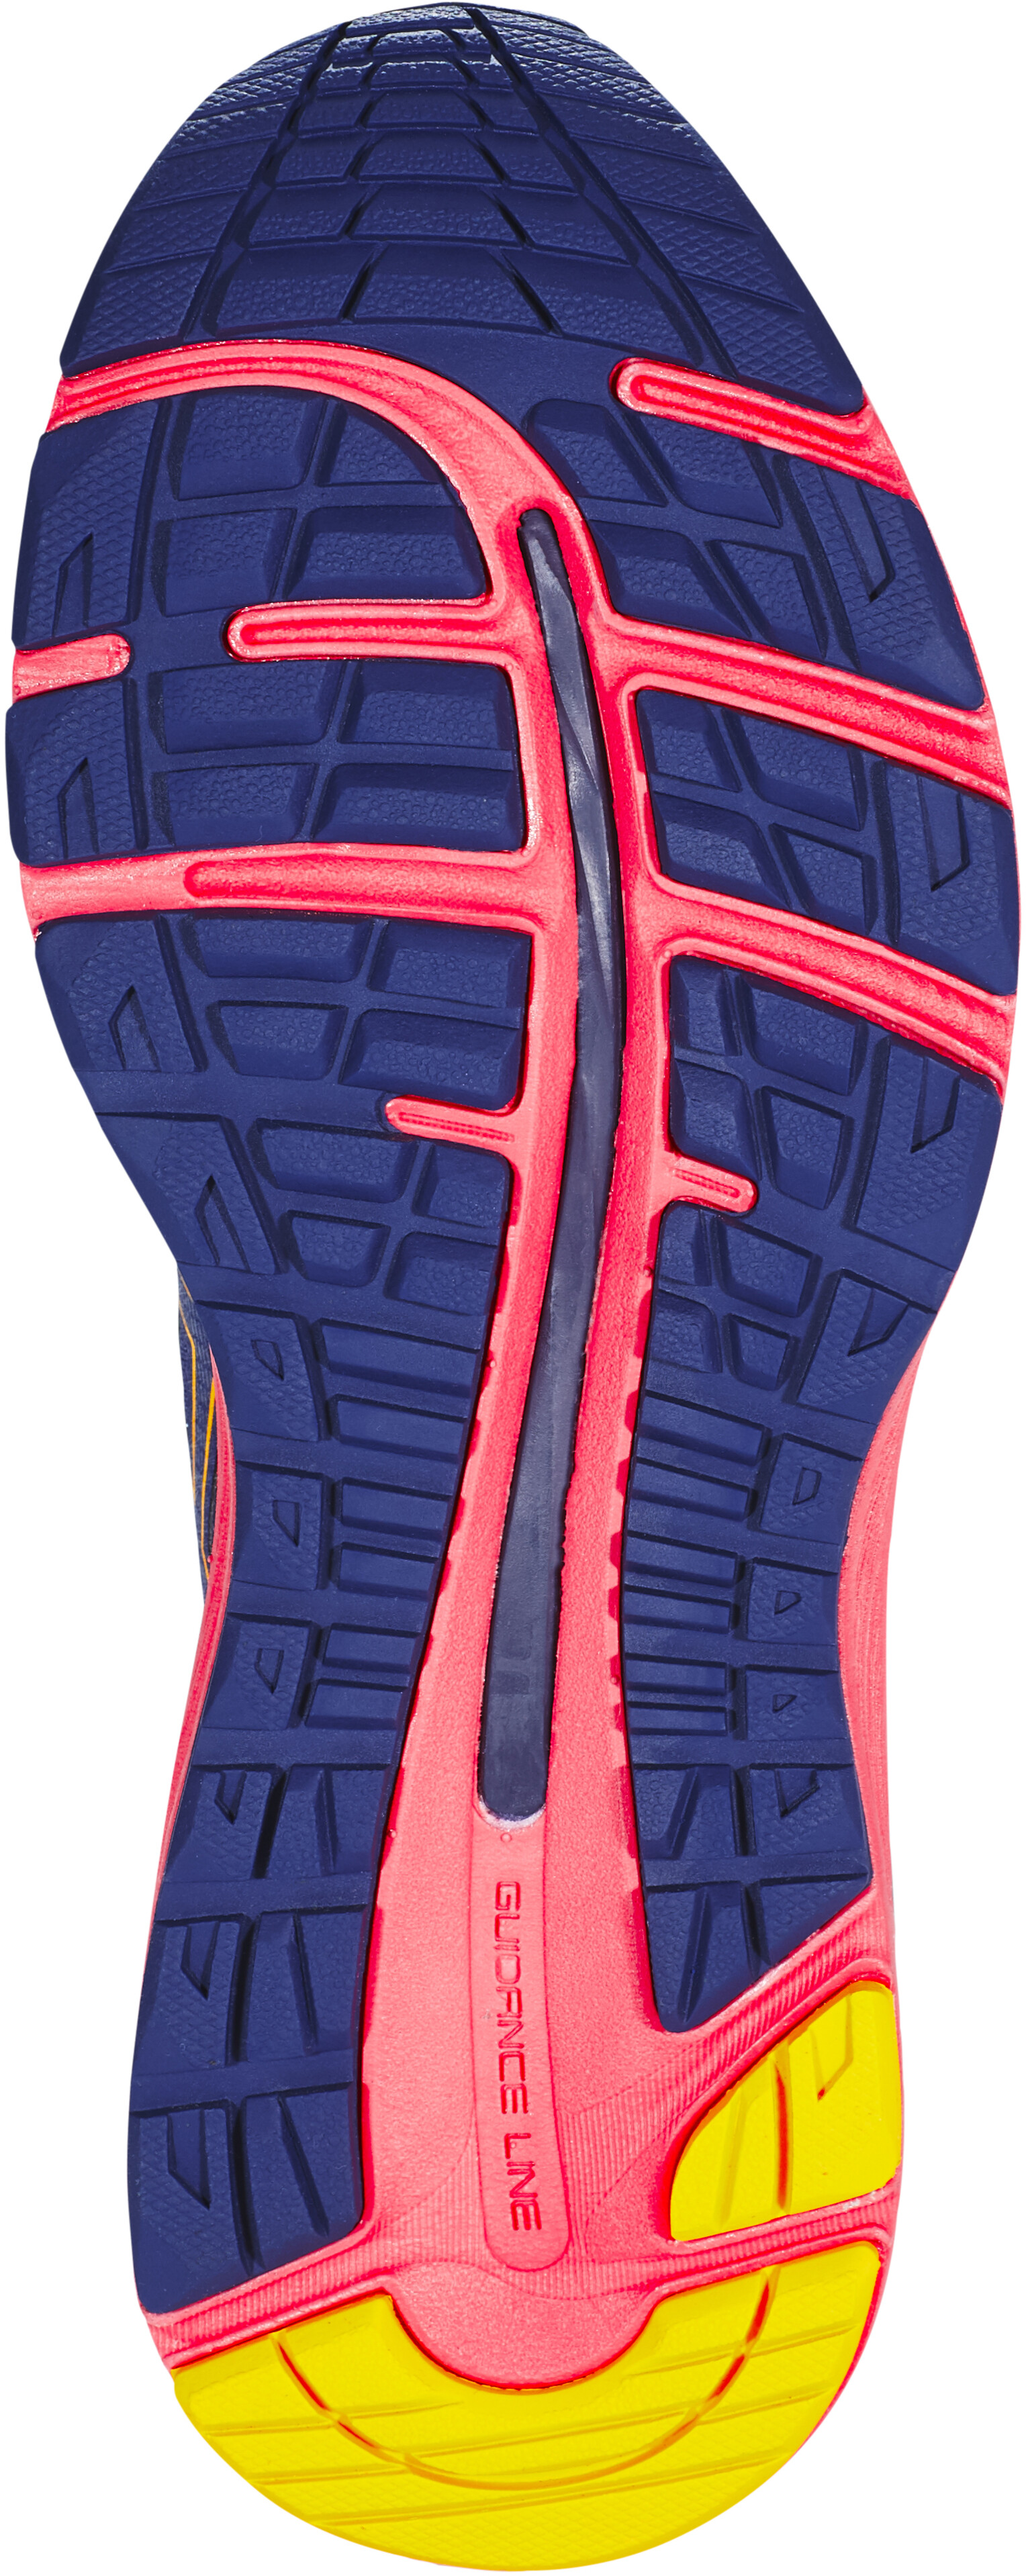 01dac042c8 asics Gel-Cumulus 20 G-TX - Zapatillas running Mujer - rosa azul ...